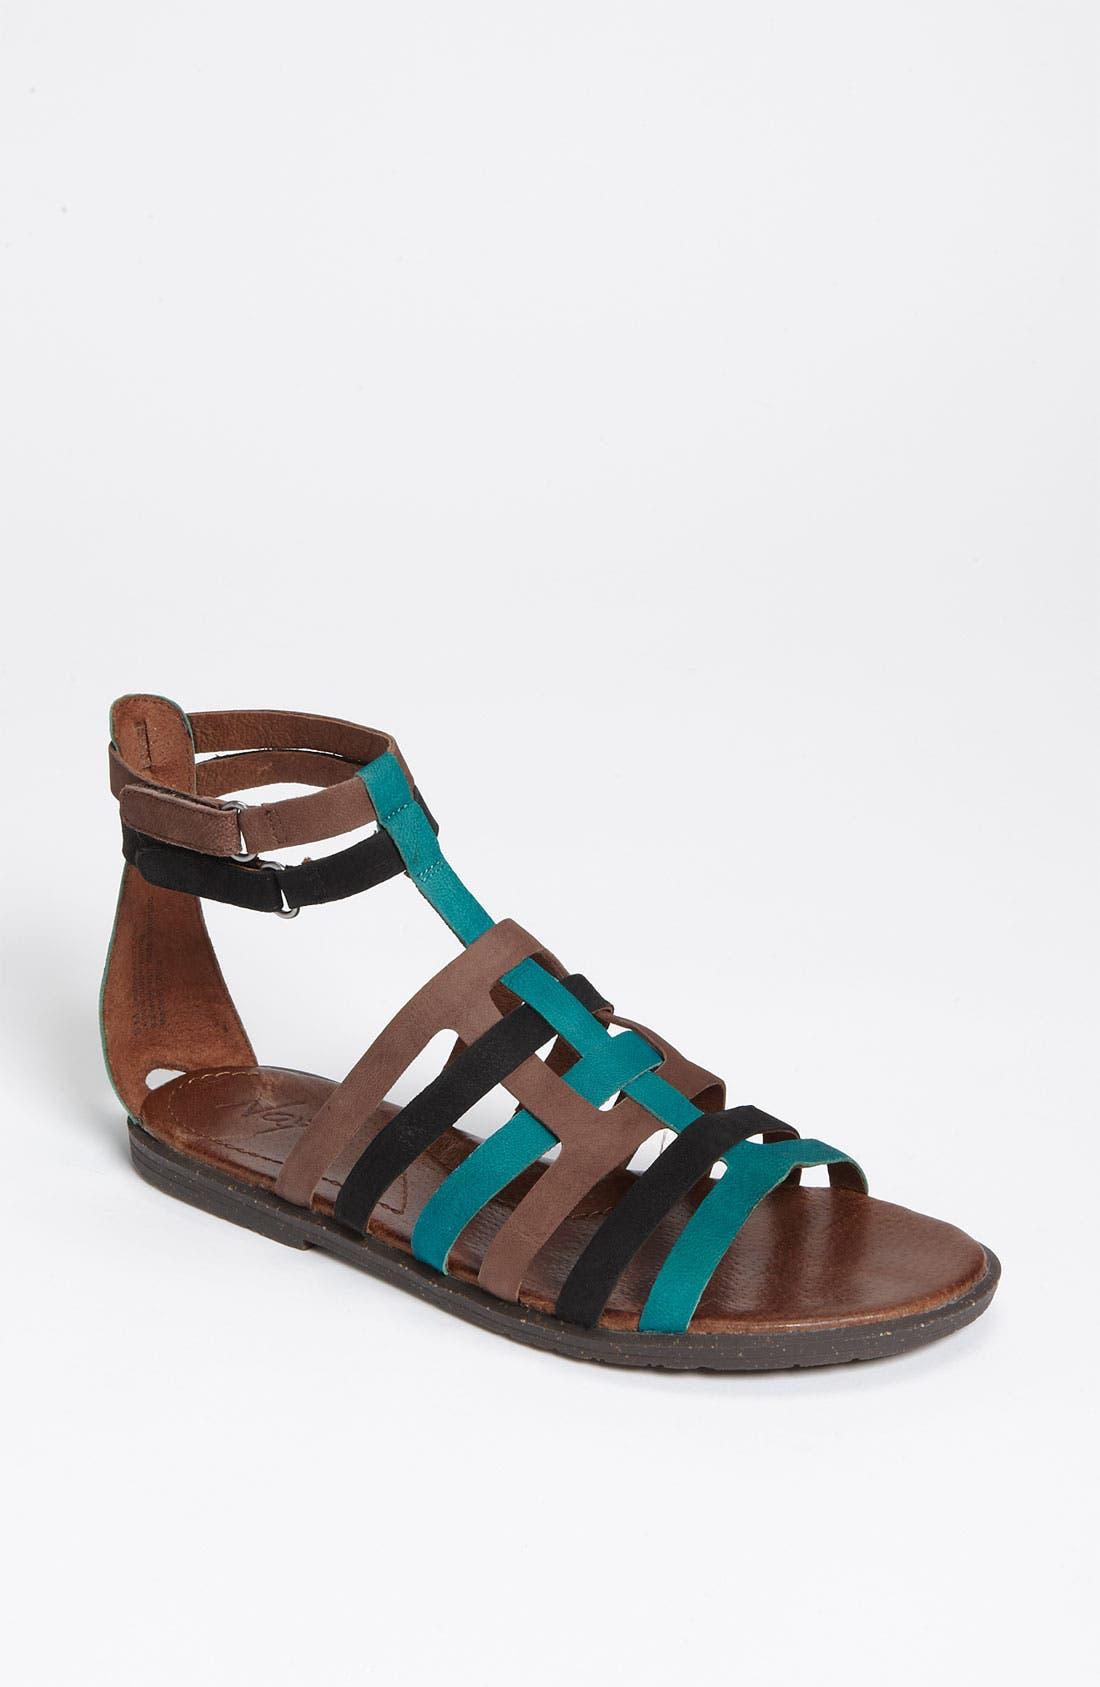 Alternate Image 1 Selected - Naya 'Zamira' Sandal